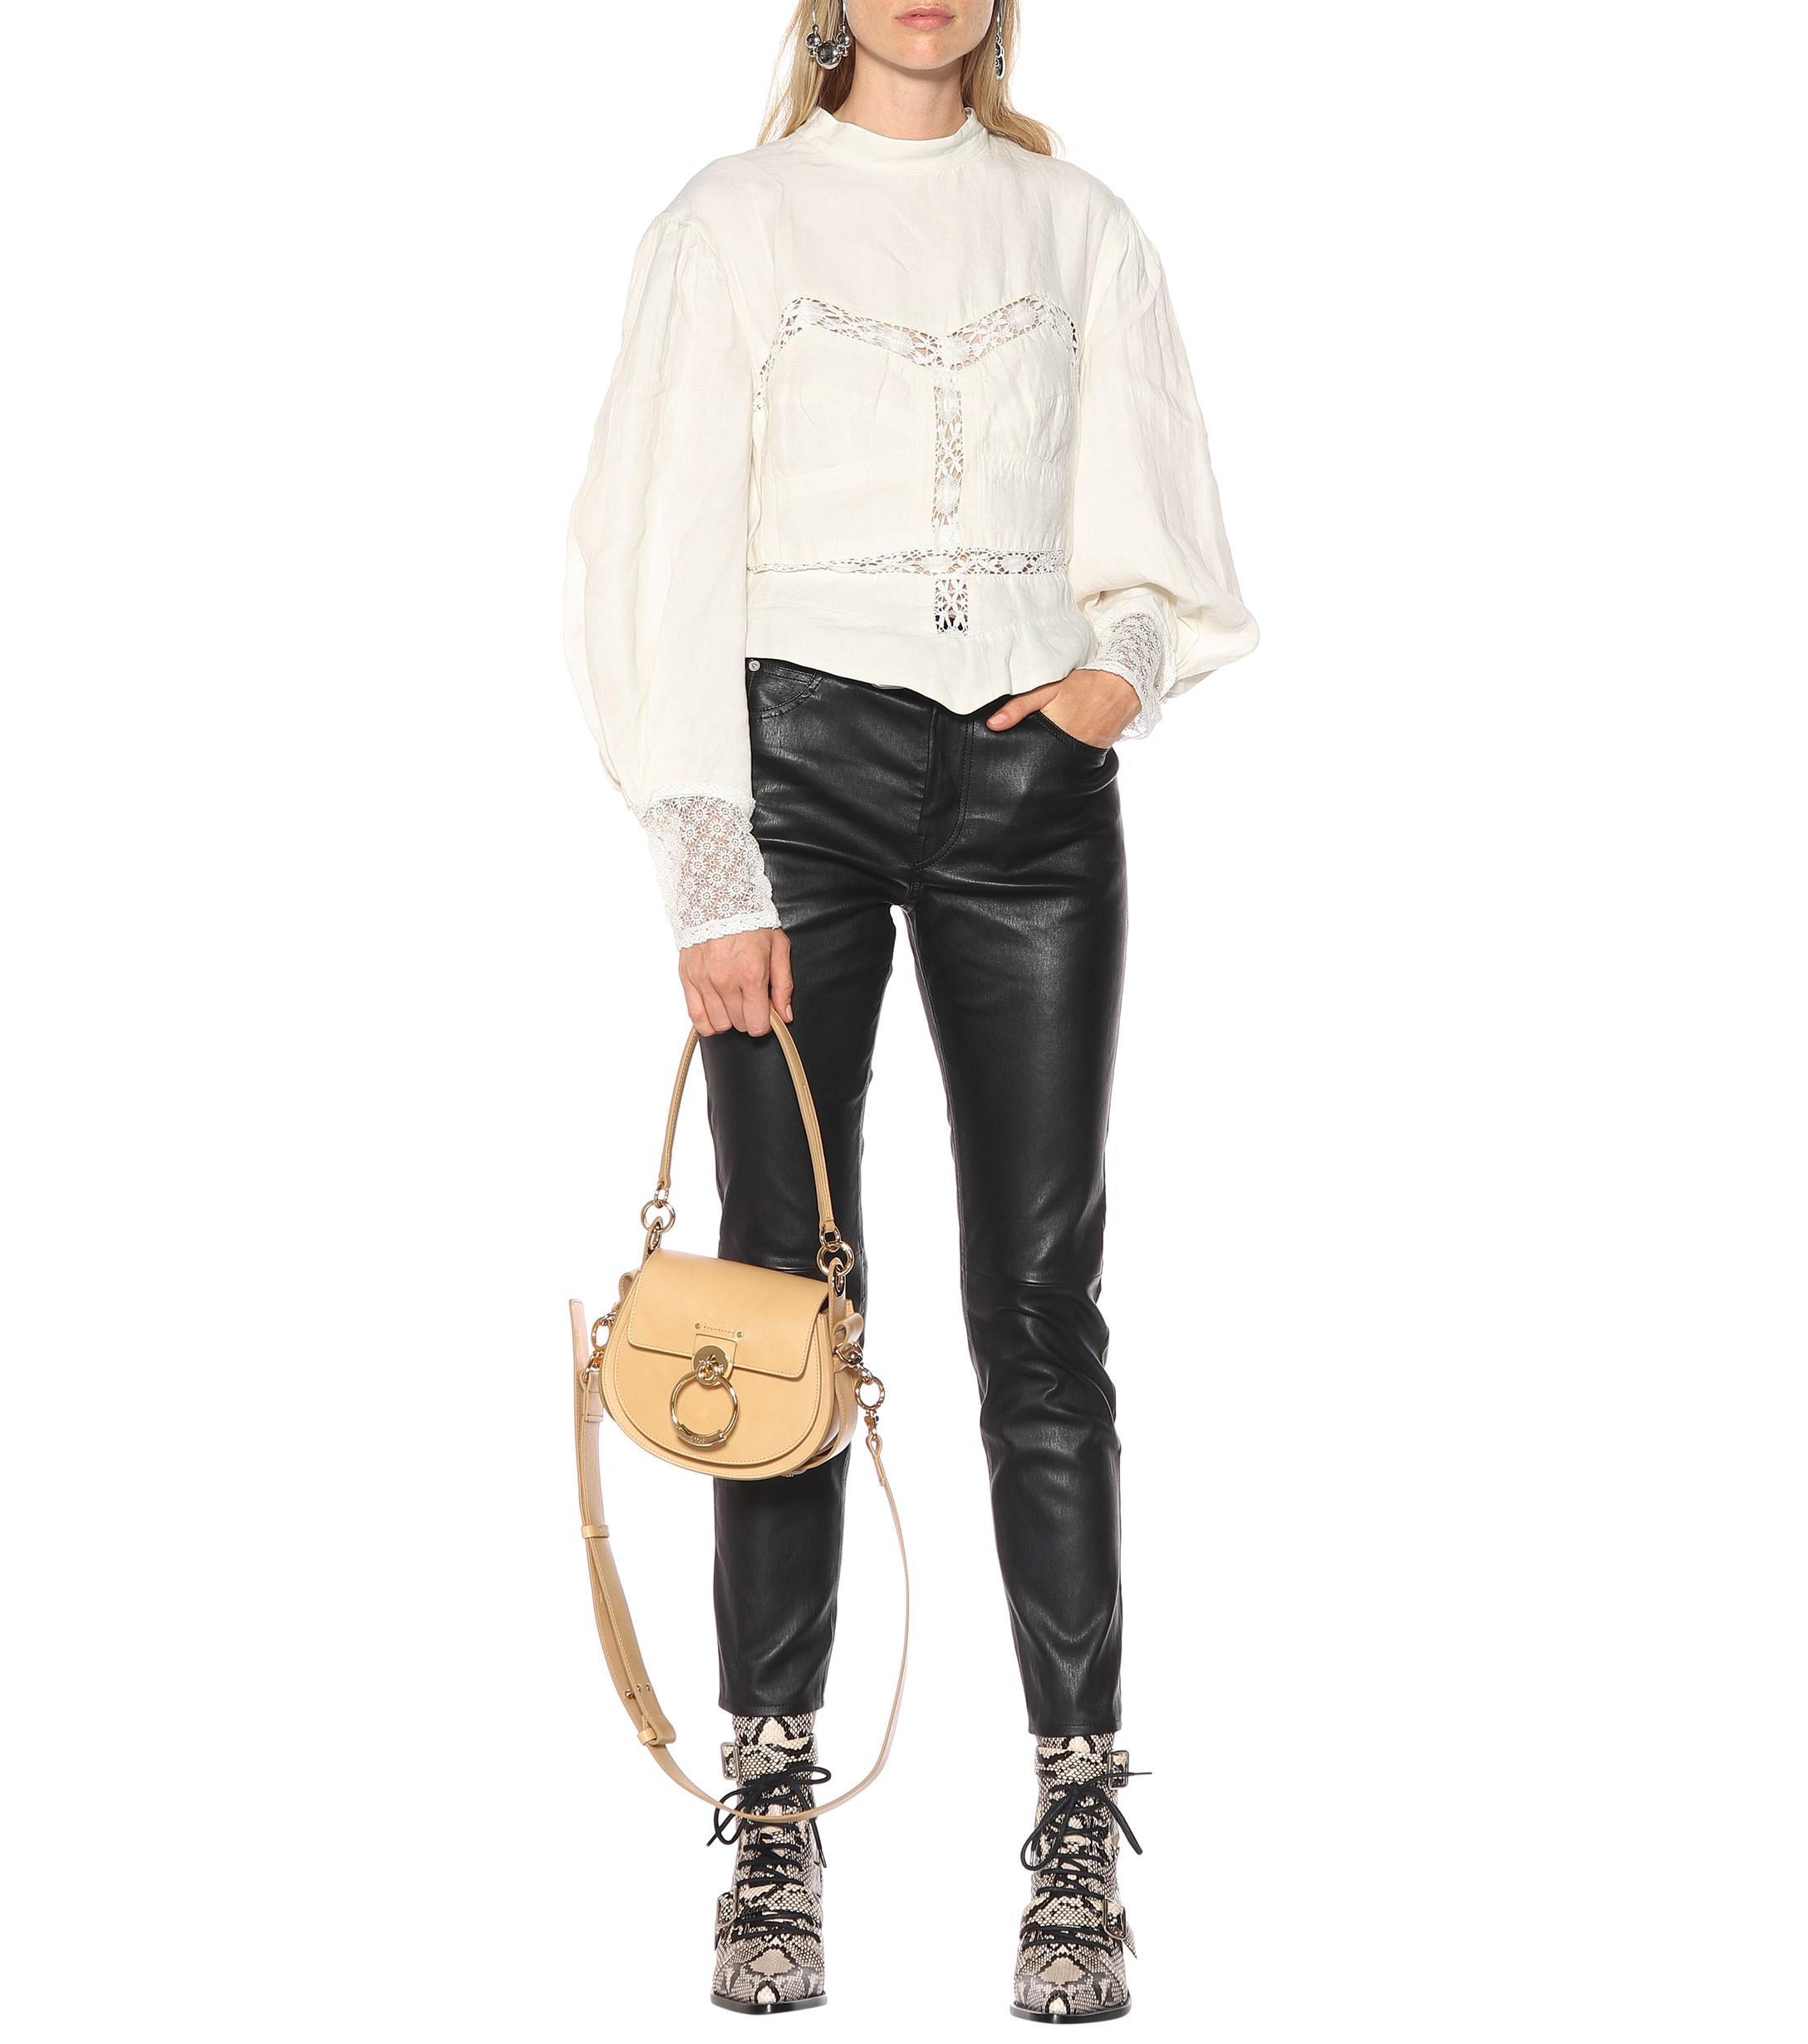 dc009a99c8d5b4 Isabel Marant - White Lyneth Lace-trimmed Cotton Blouse - Lyst. View  fullscreen